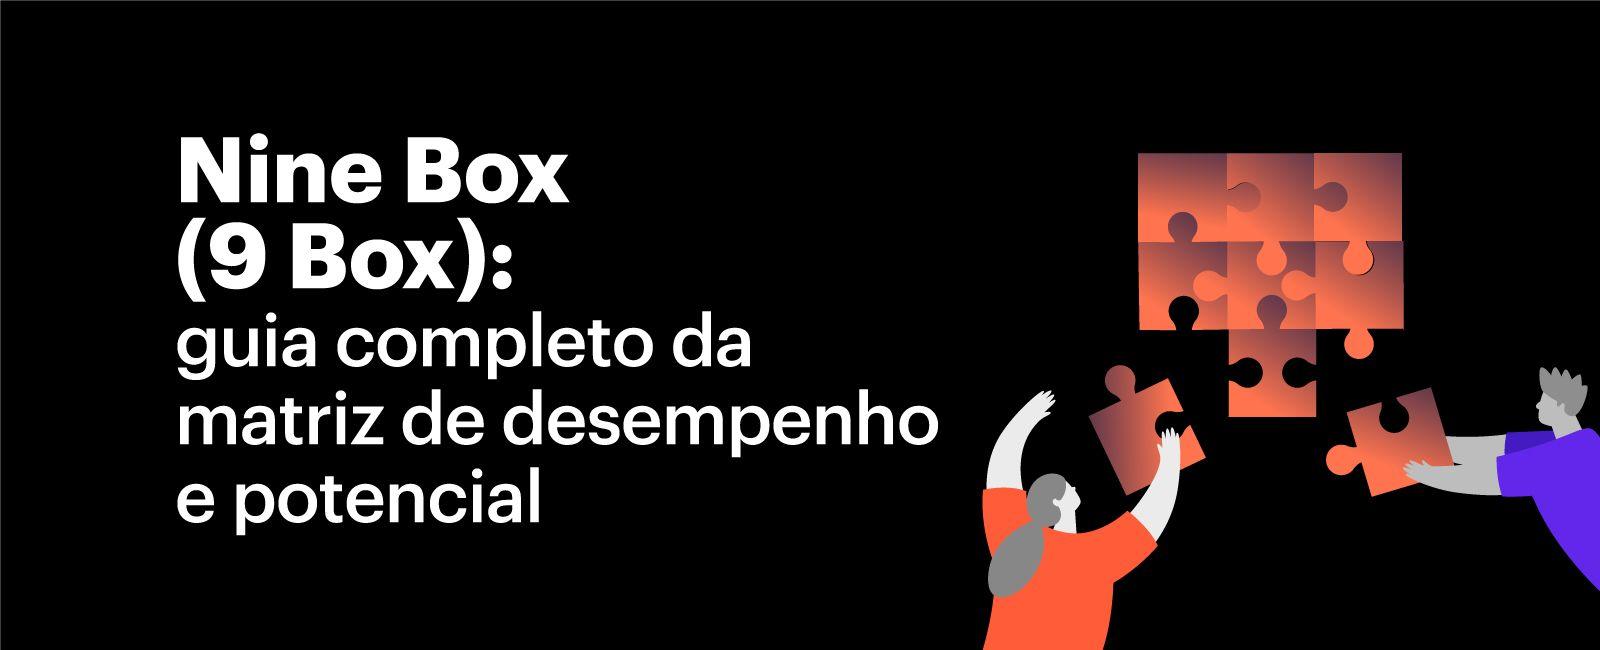 ebook-9box